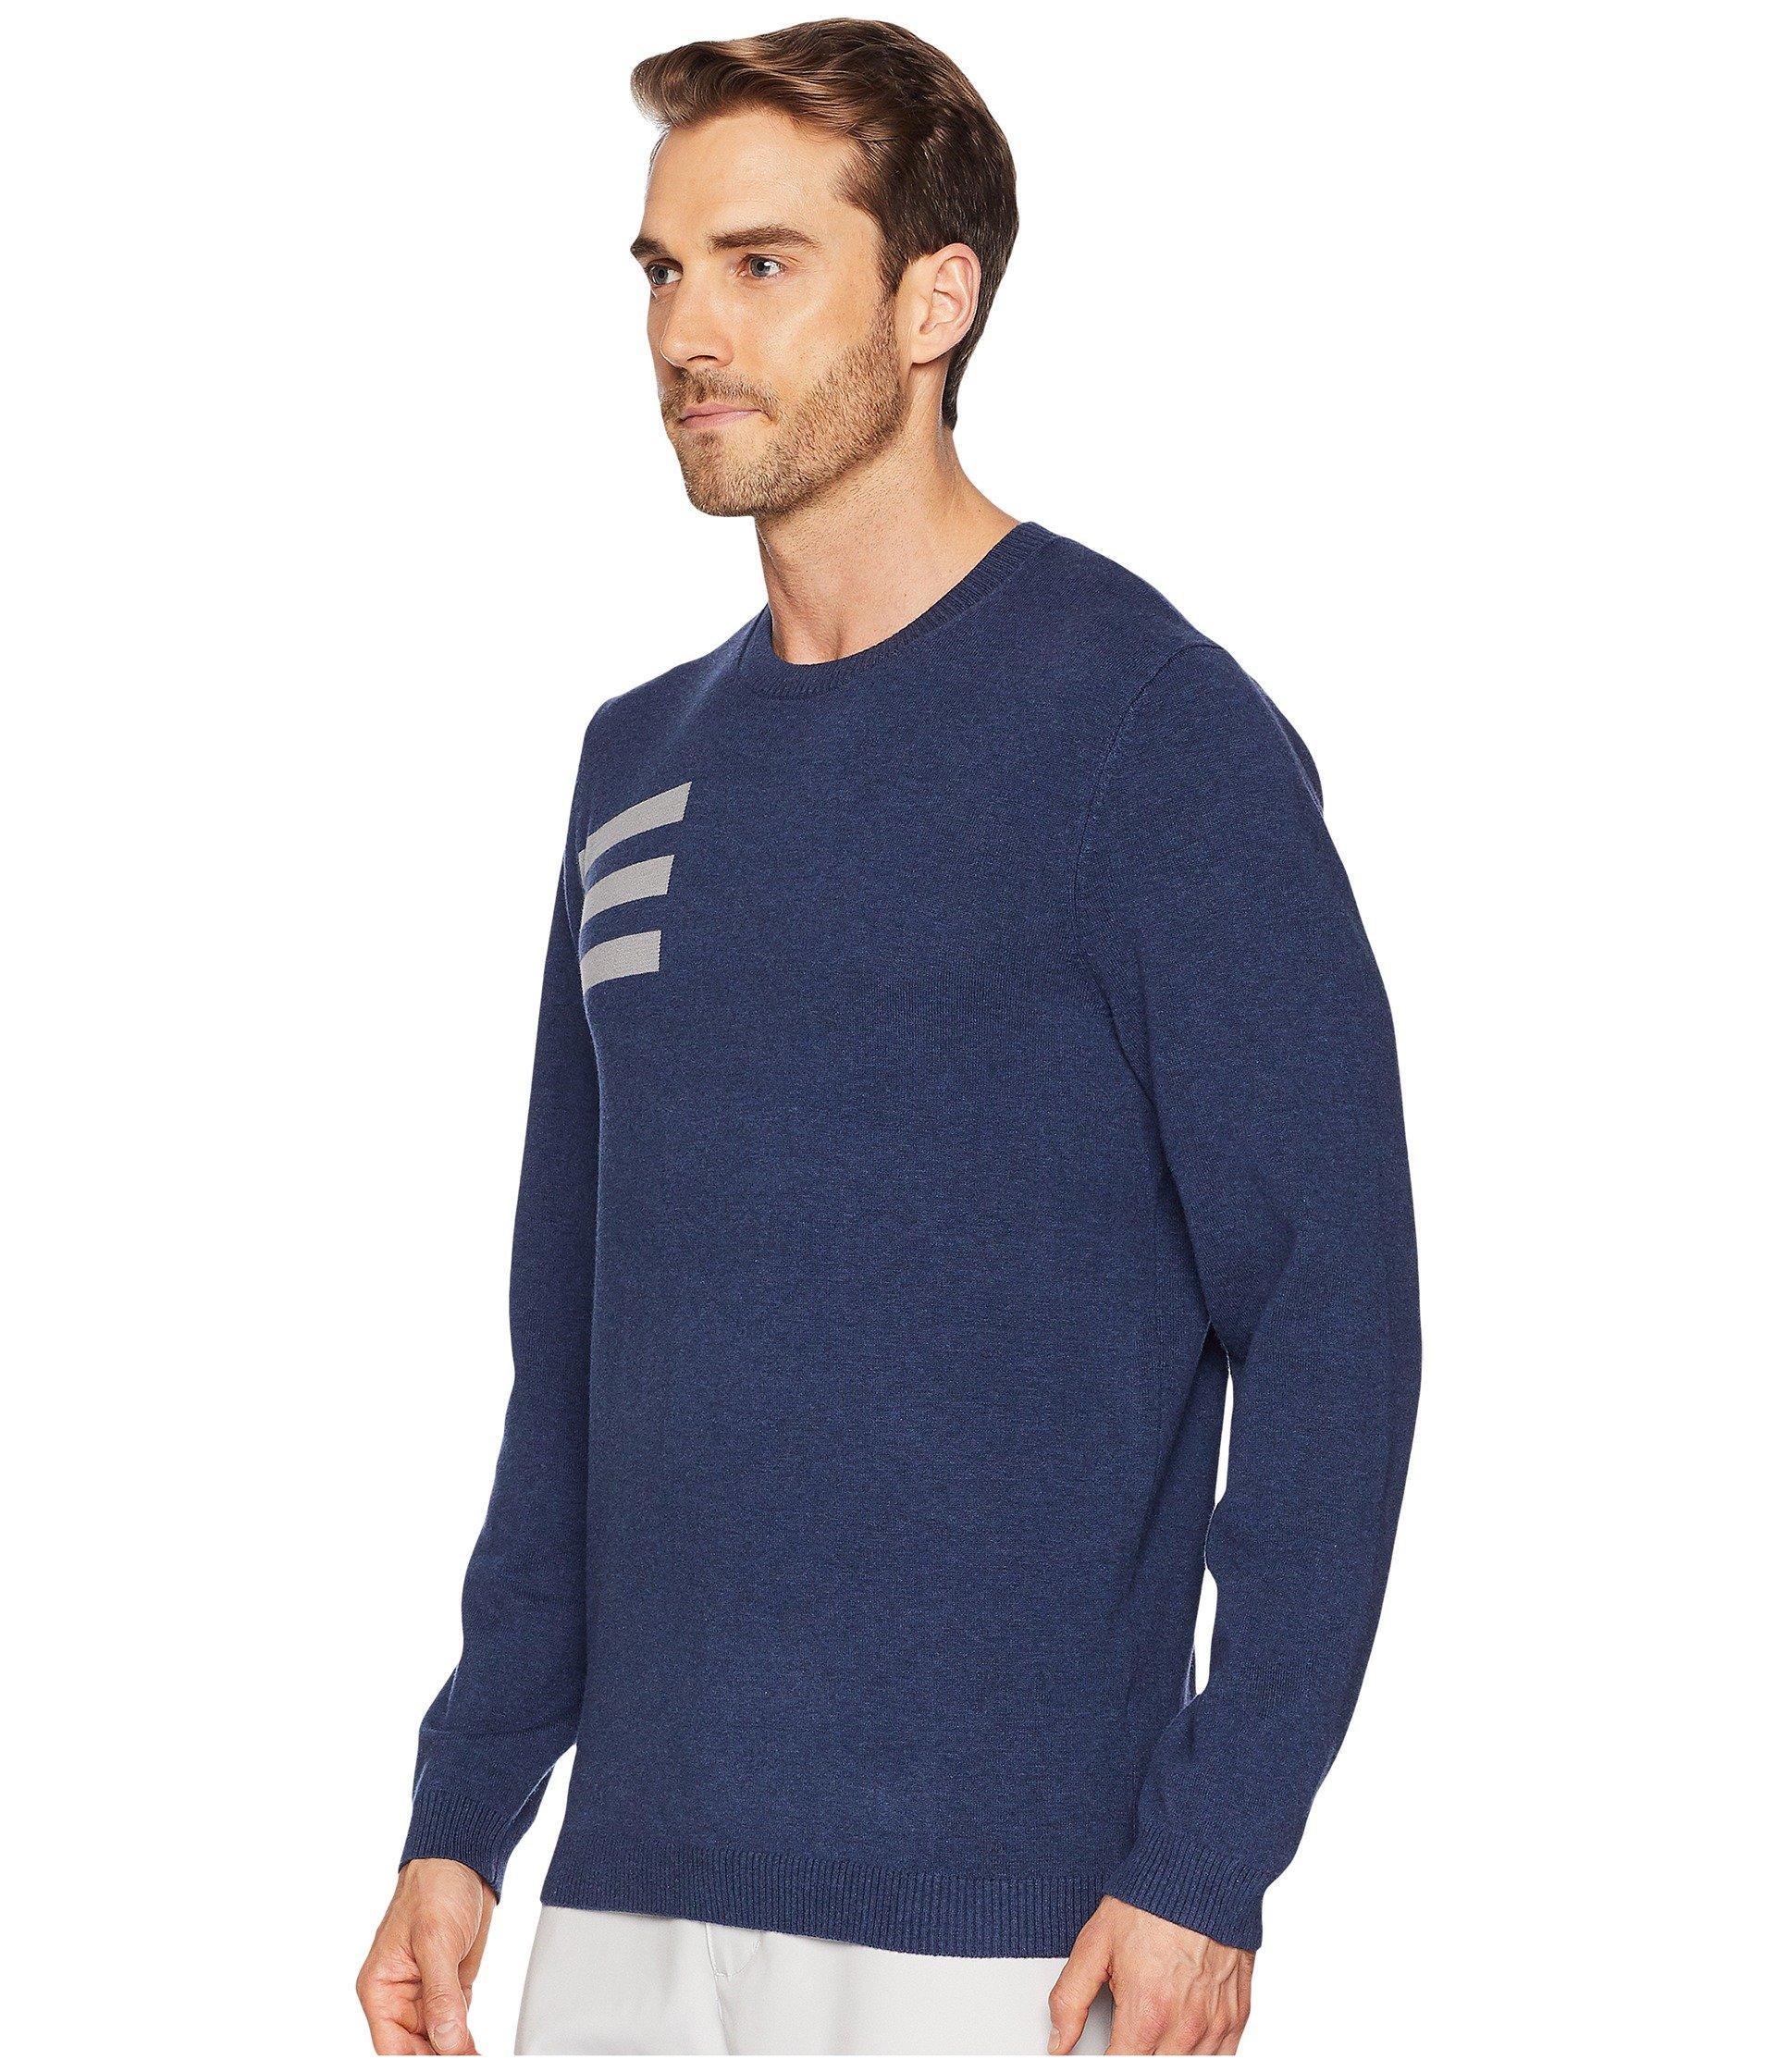 91ed34bd2 Lyst - adidas Originals 3-stripes Crew Neck Sweater in Blue for Men - Save  15%